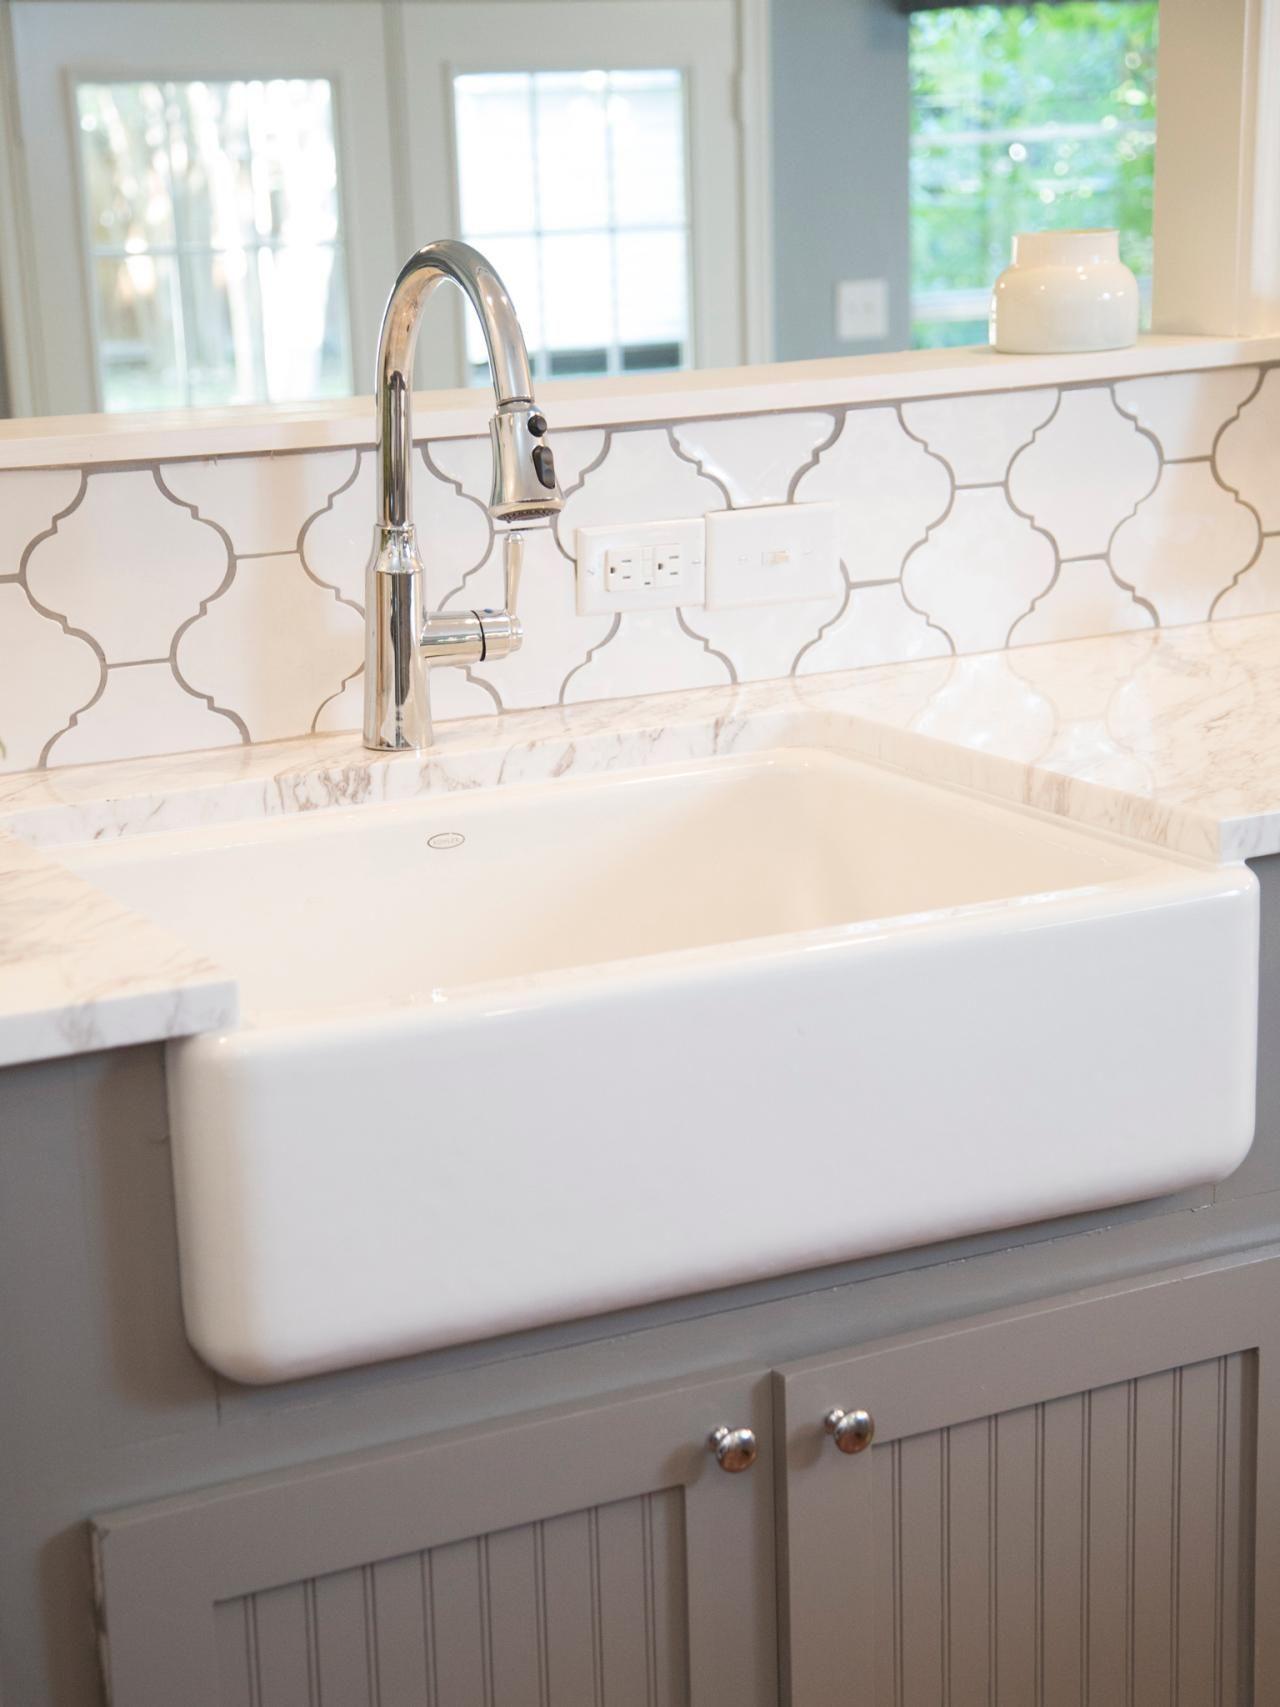 Morrocan Tile Backsplash Part - 43: 17 Best Images About My Kitchen On Pinterest   Countertops, Naya Rivera And  Tile